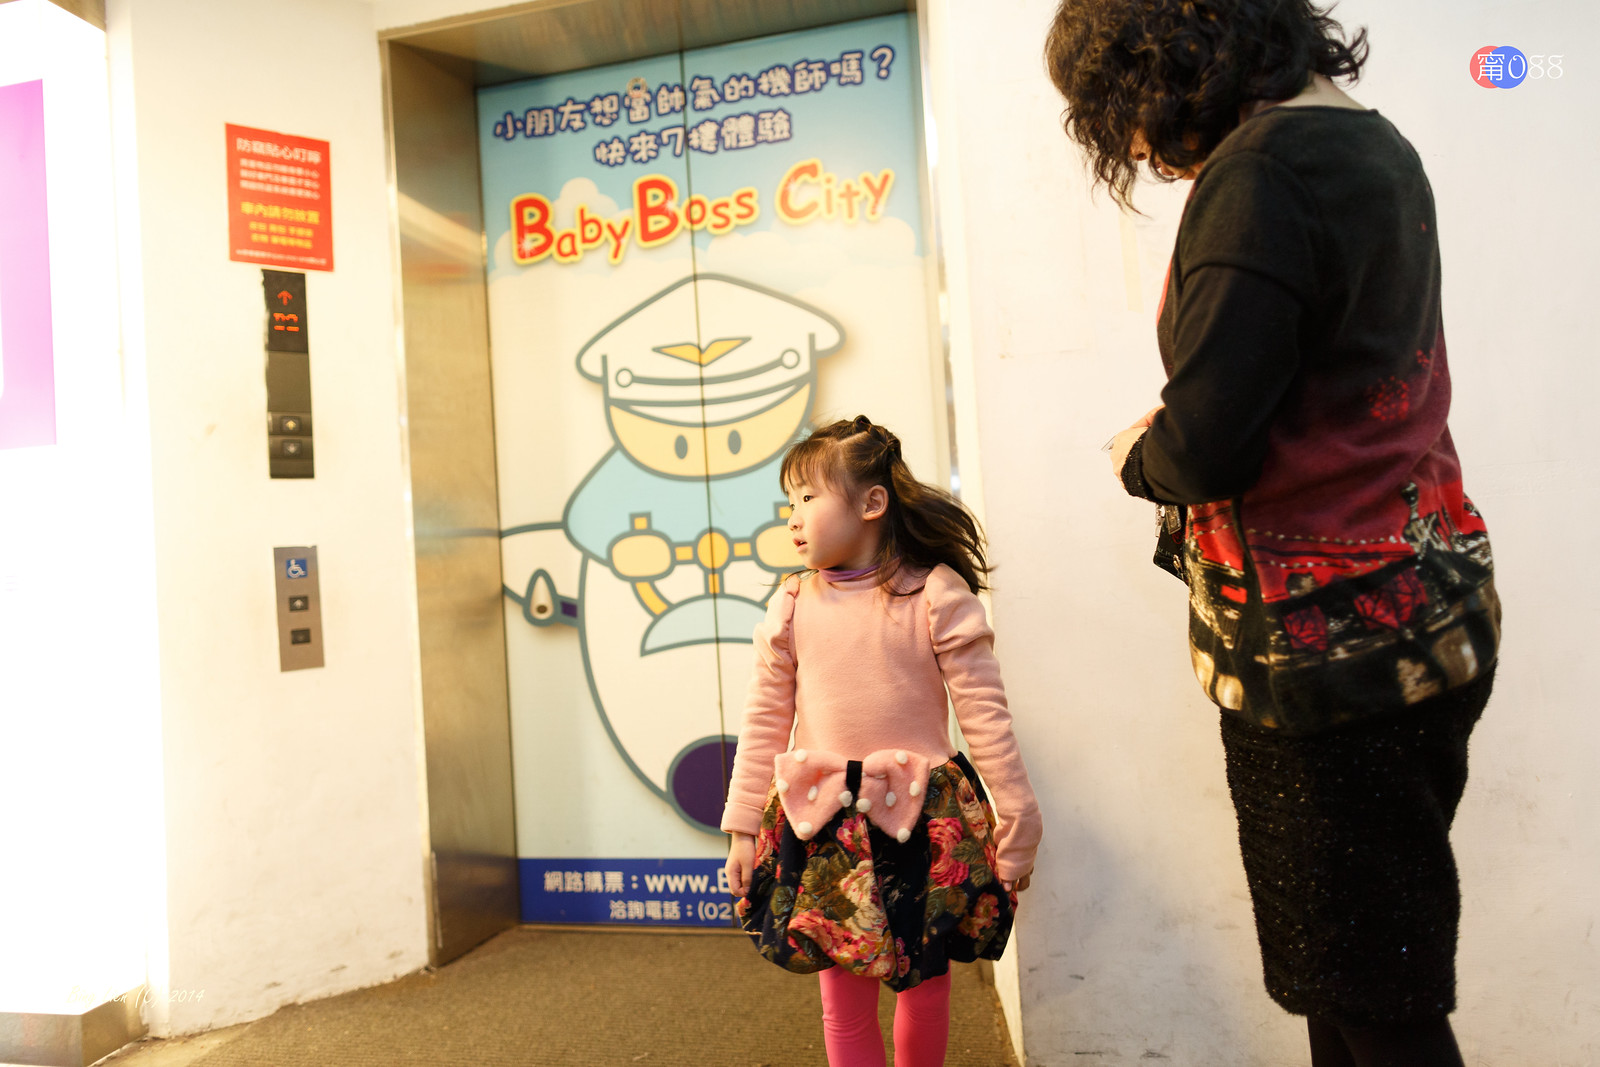 BabyBoss City (1) 觀光飯店